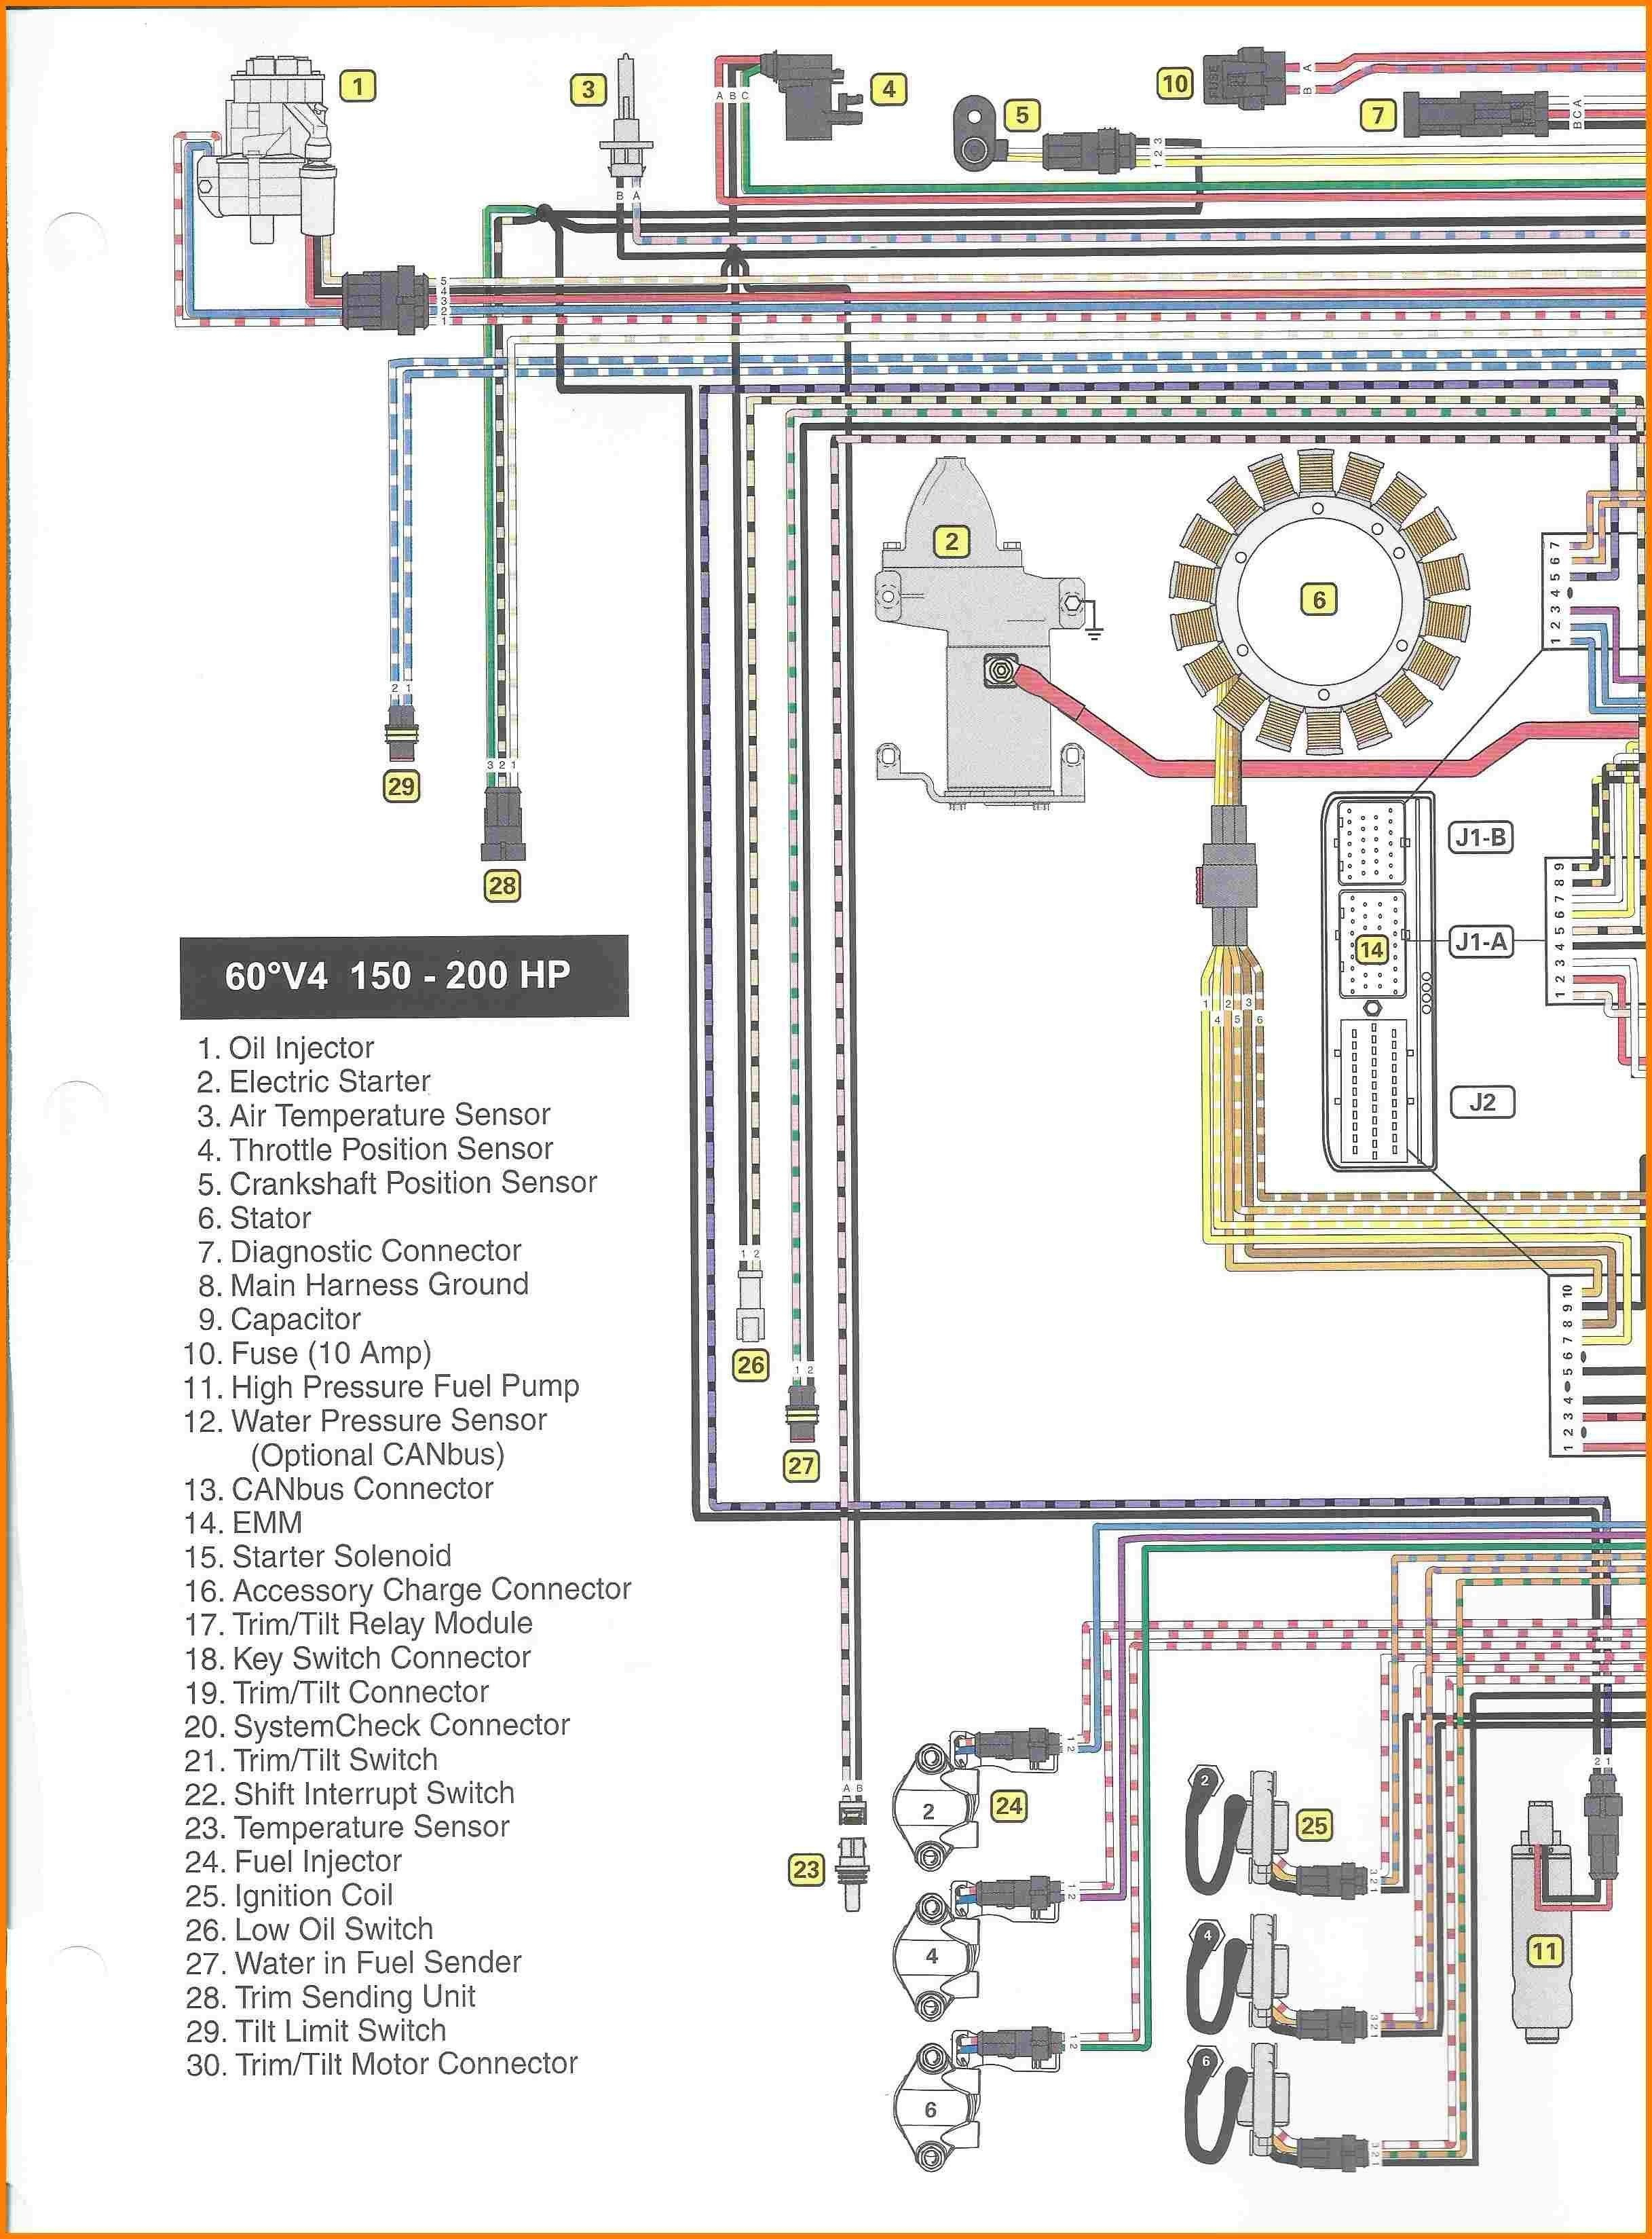 medium resolution of 12 24 trolling motor wiring motorguide volt and battery diagram 24 12 24 trolling motor wiring